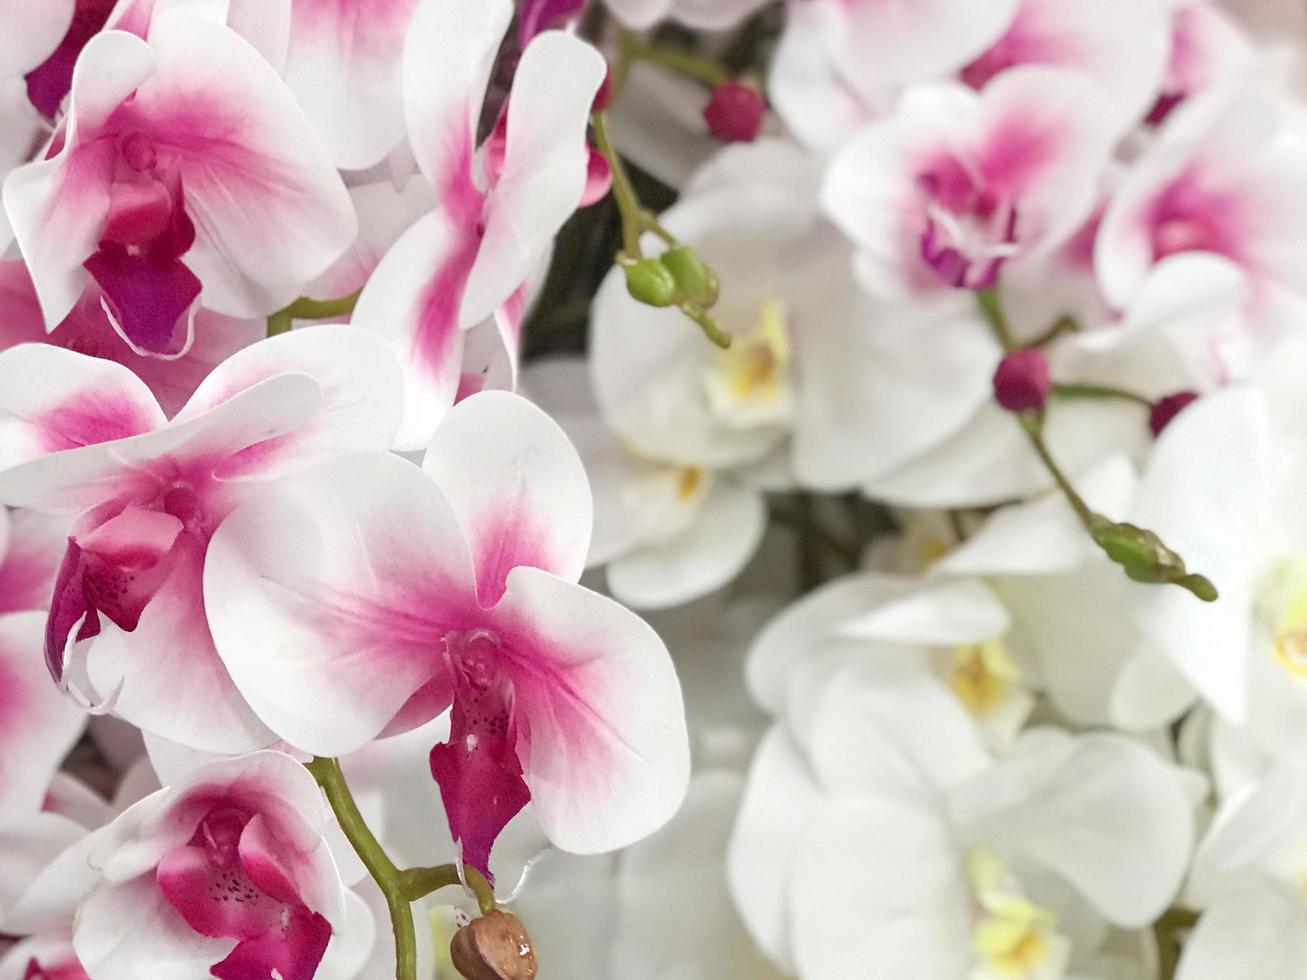 orchidee floreali foto